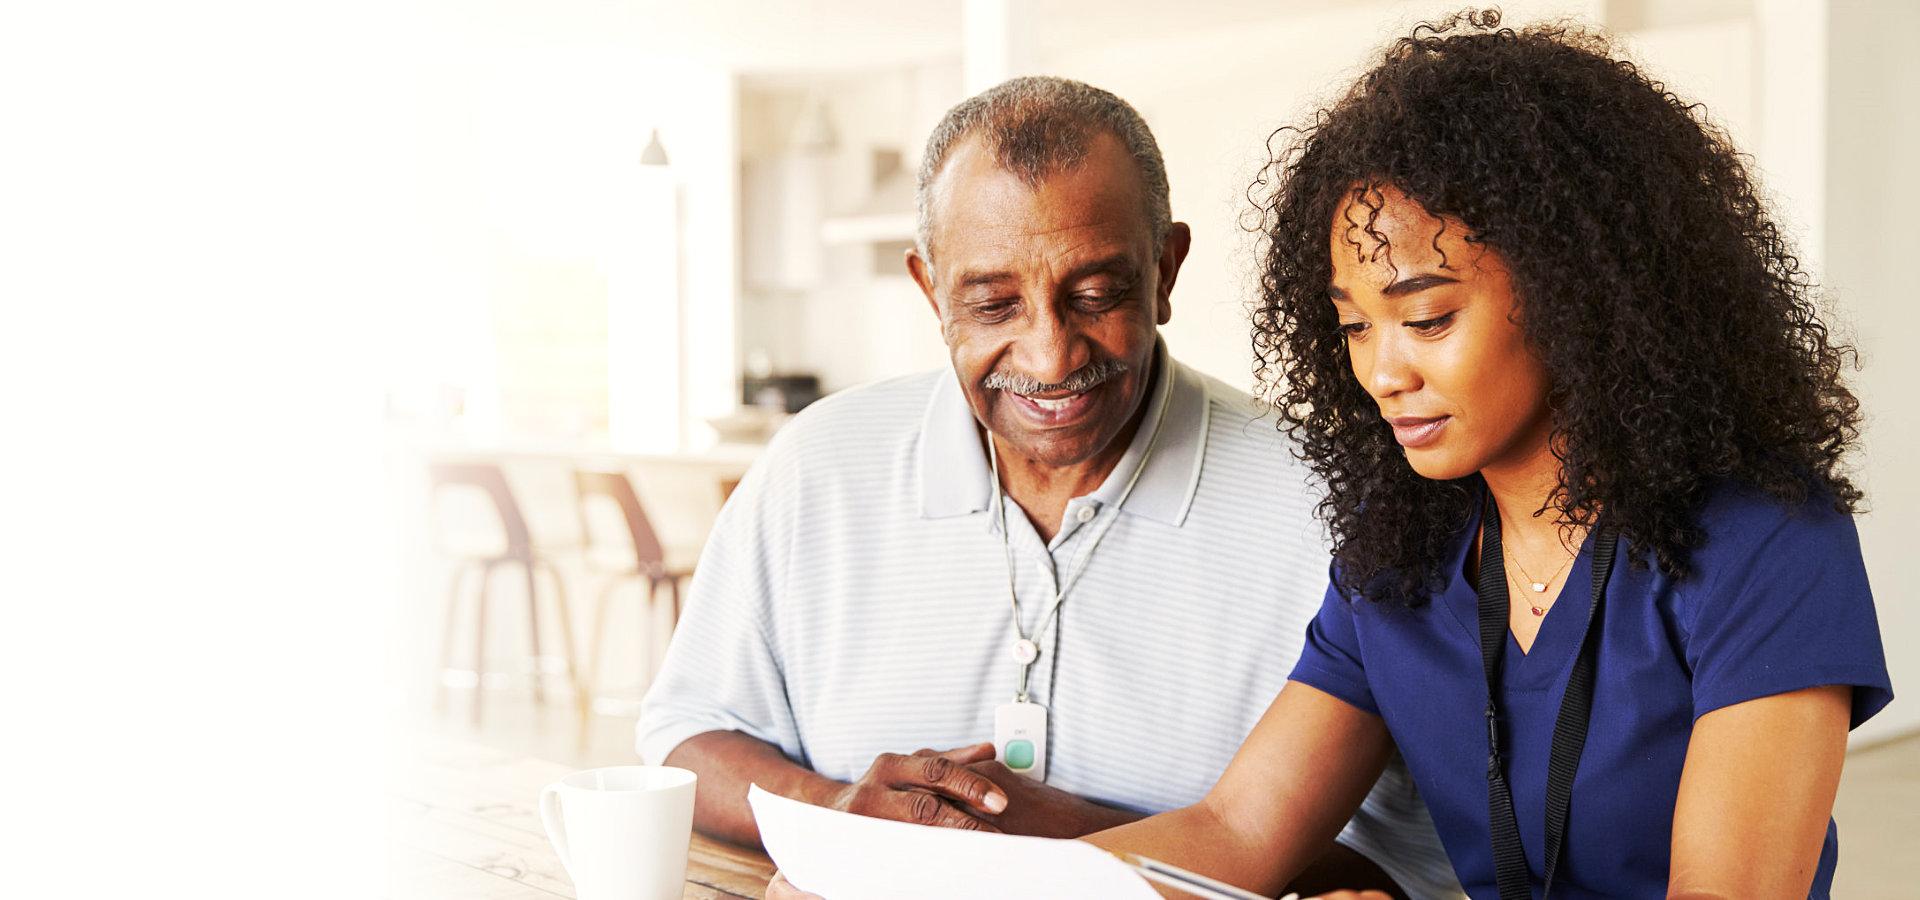 caregiver and elderly man having conversation